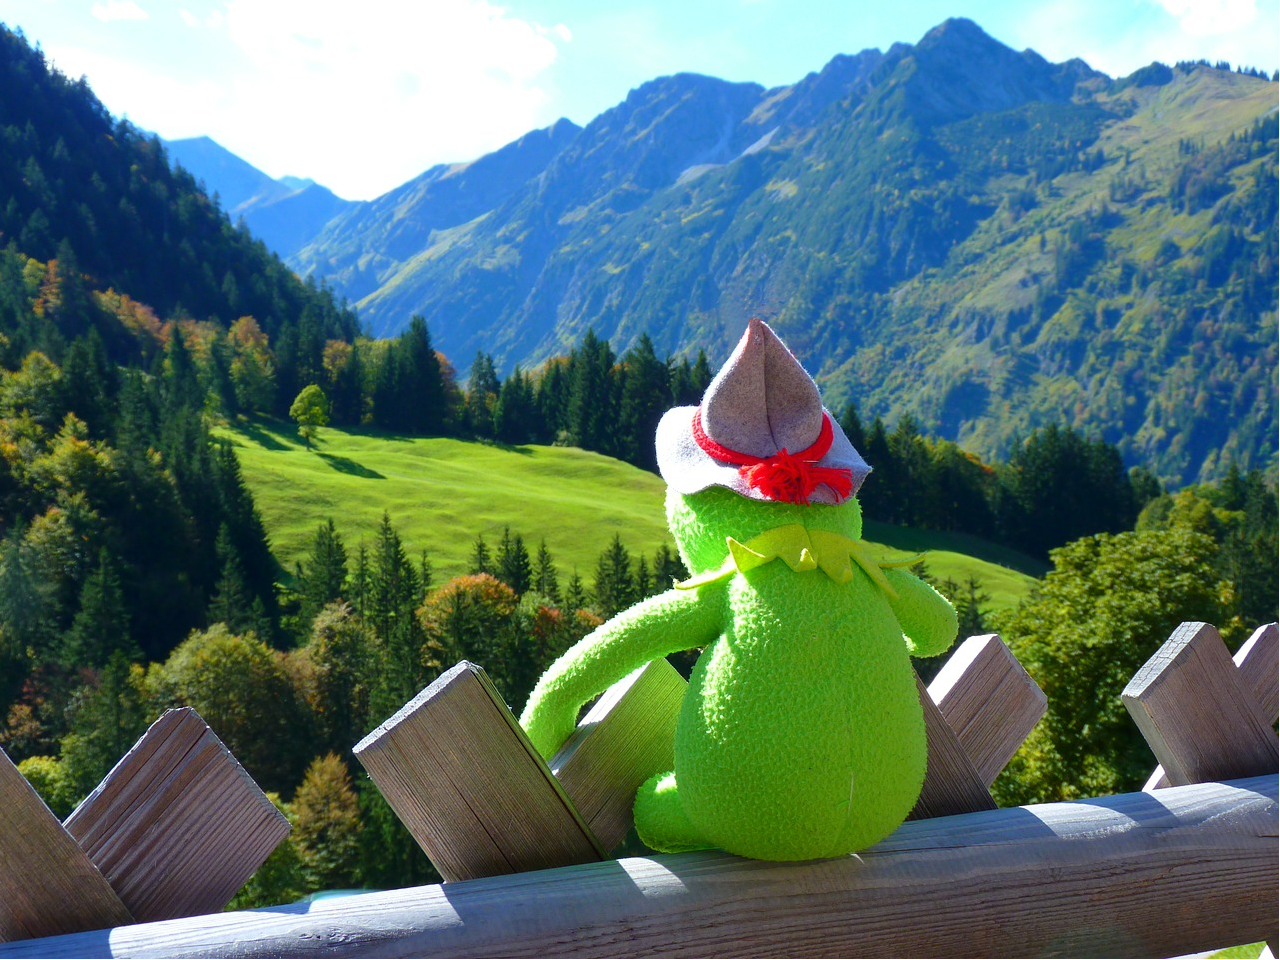 Kermit montagne2